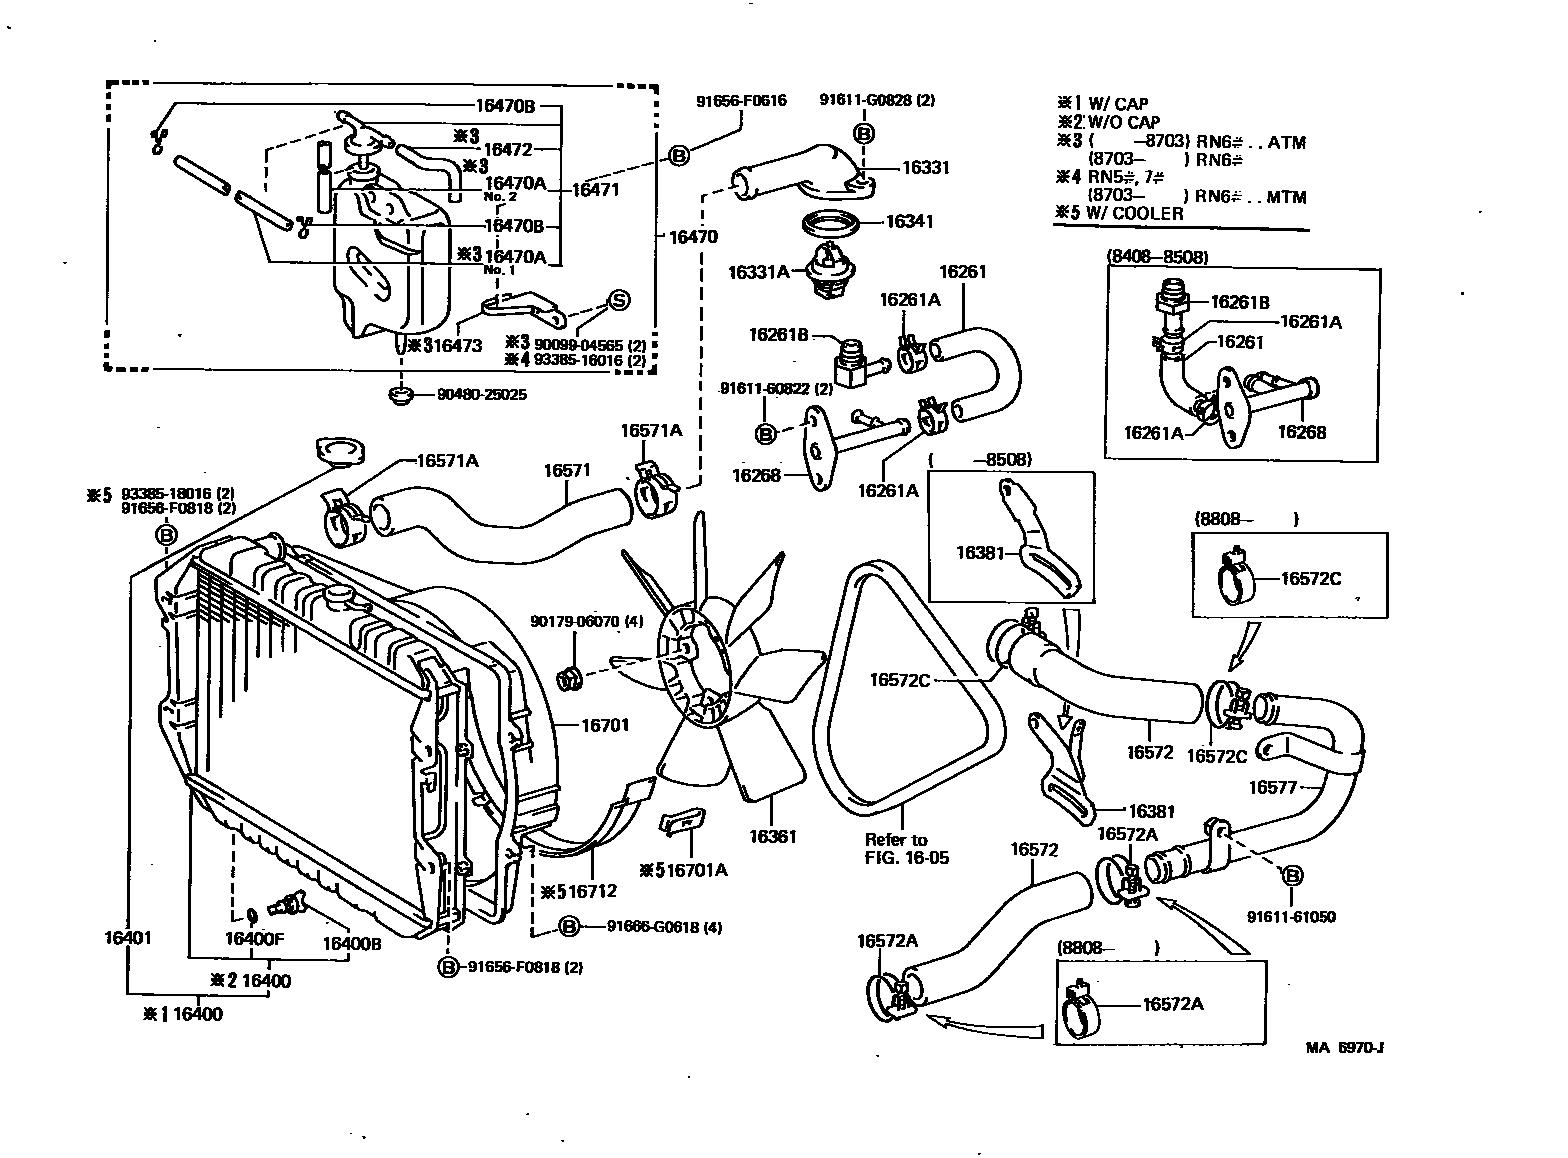 toyota pickup wiring harness 22re motor diagram wiring diagram data 1980 toyota pickup wiring harness 22re motor diagram wiring diagram data